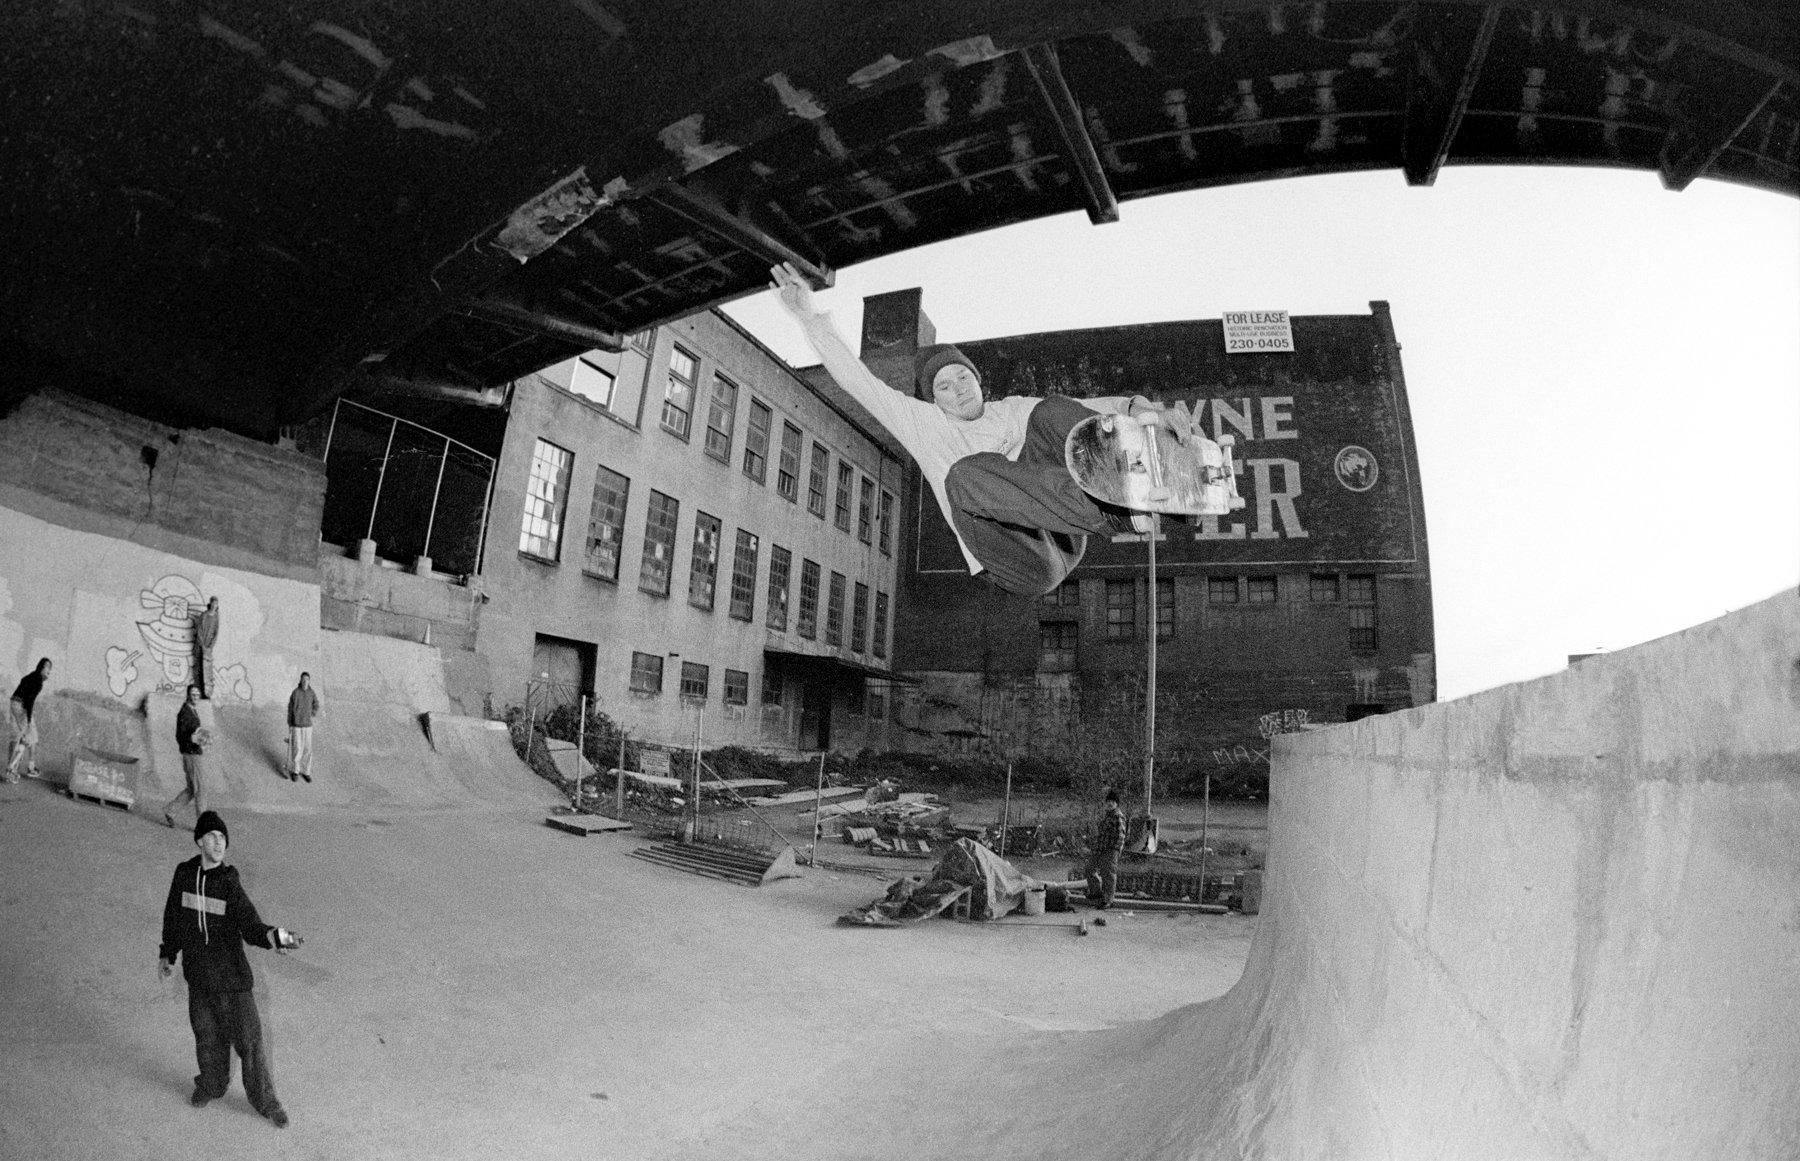 Image of Julien Stranger Burnside 1991, by Tobin Yelland